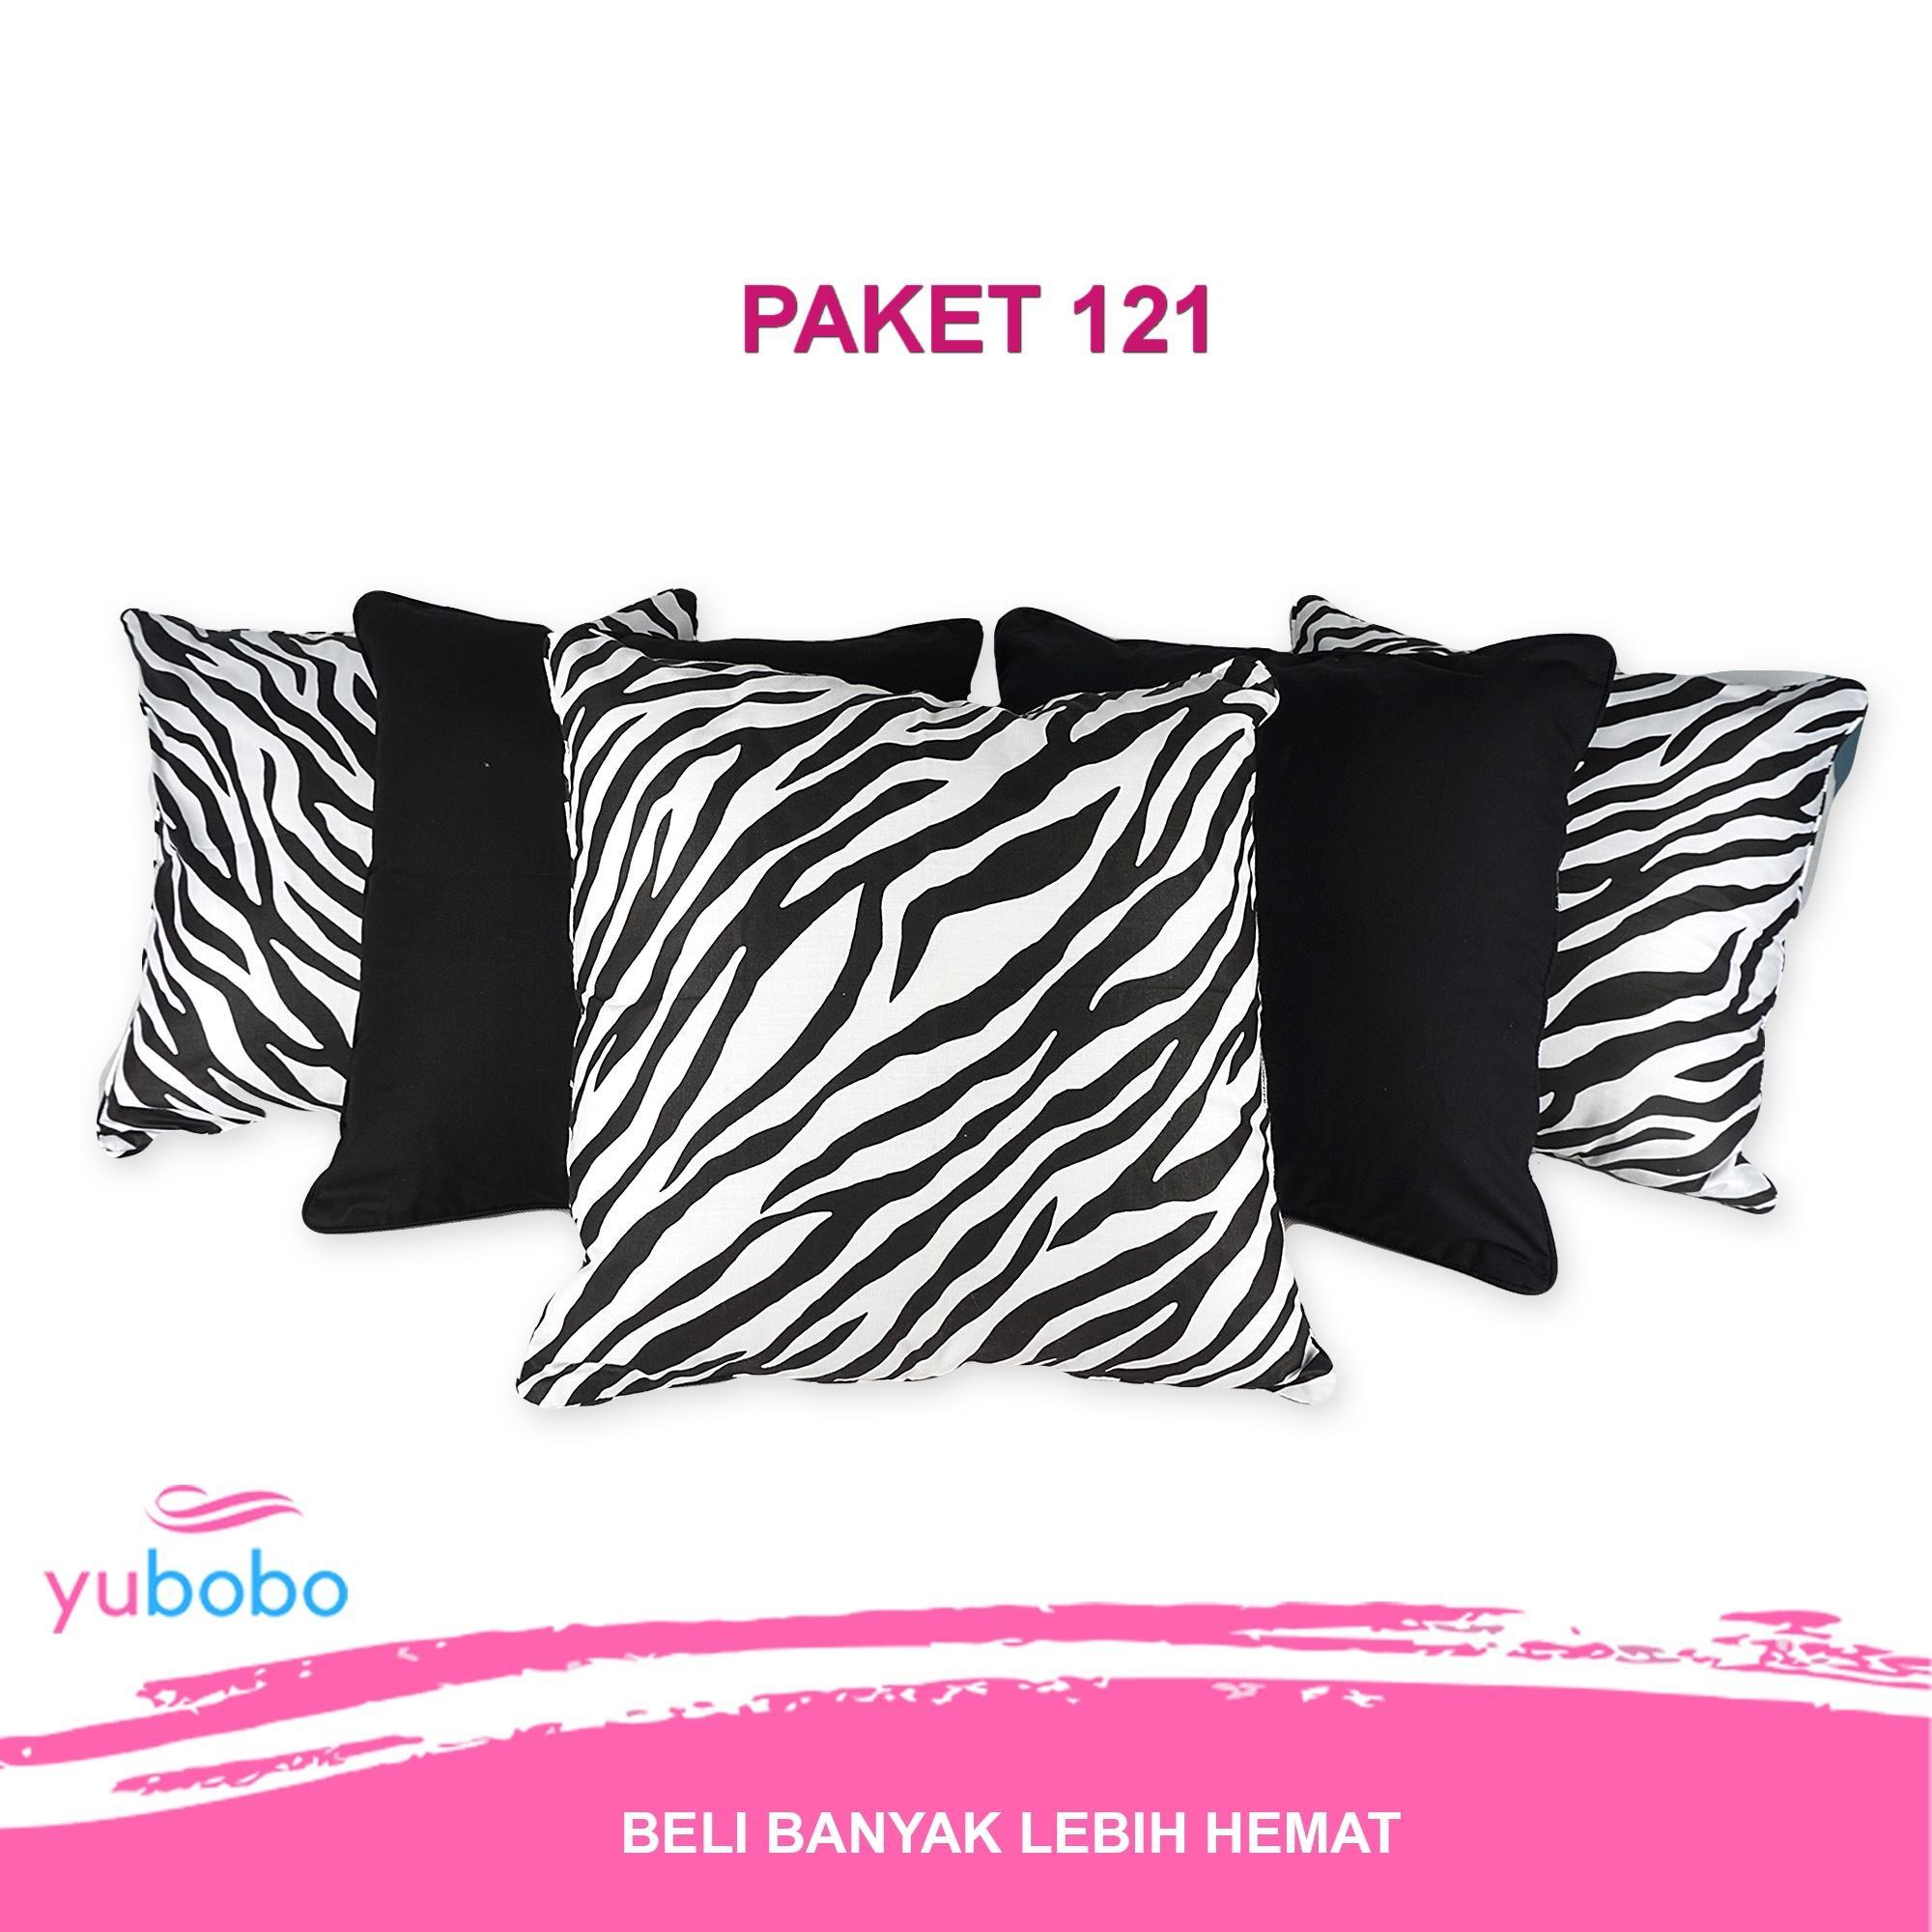 Paket Sarung Bantal Sofa (1 Set / 5 Pcs) Kursi Tamu  (Hanya Sarung) - Yubobo